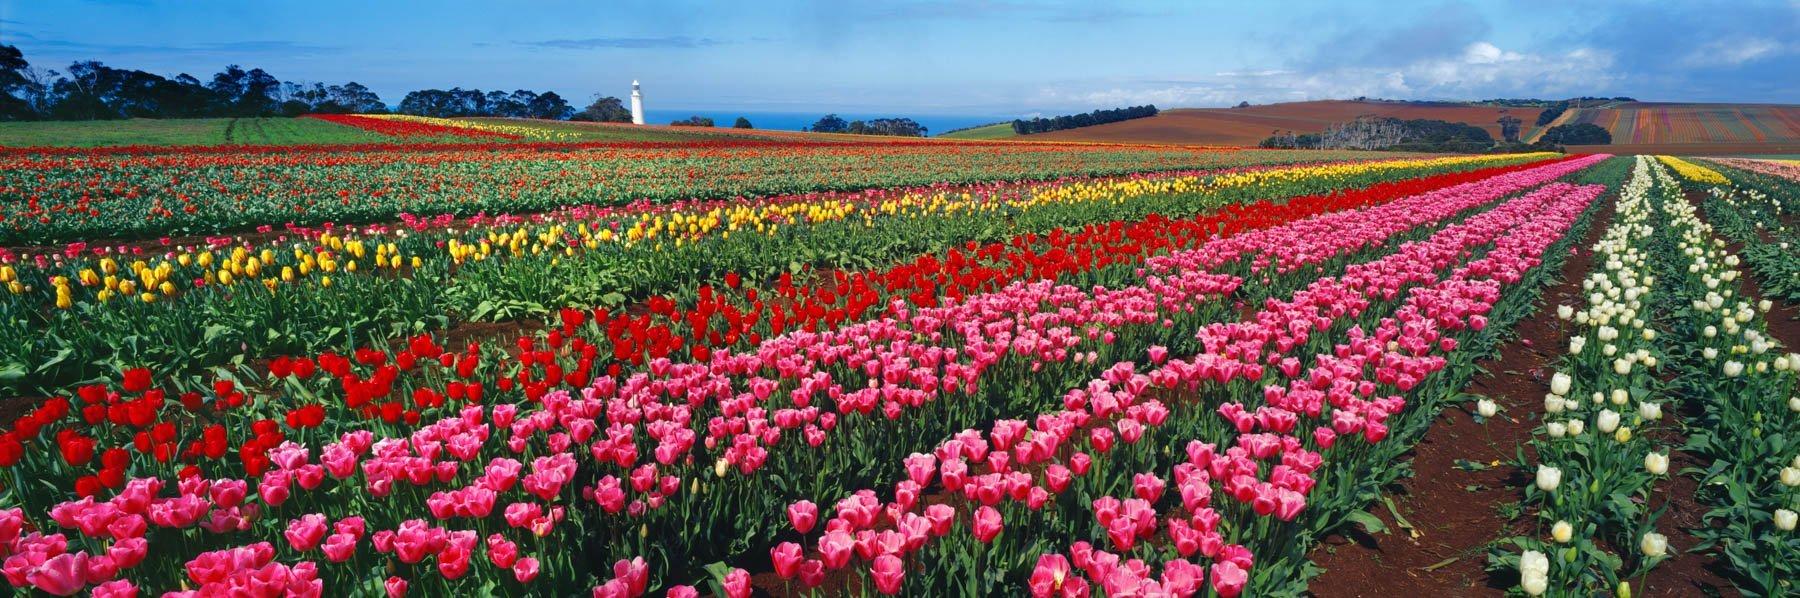 Colourful field of tulips, Wynyard, Tasmania, Australia.